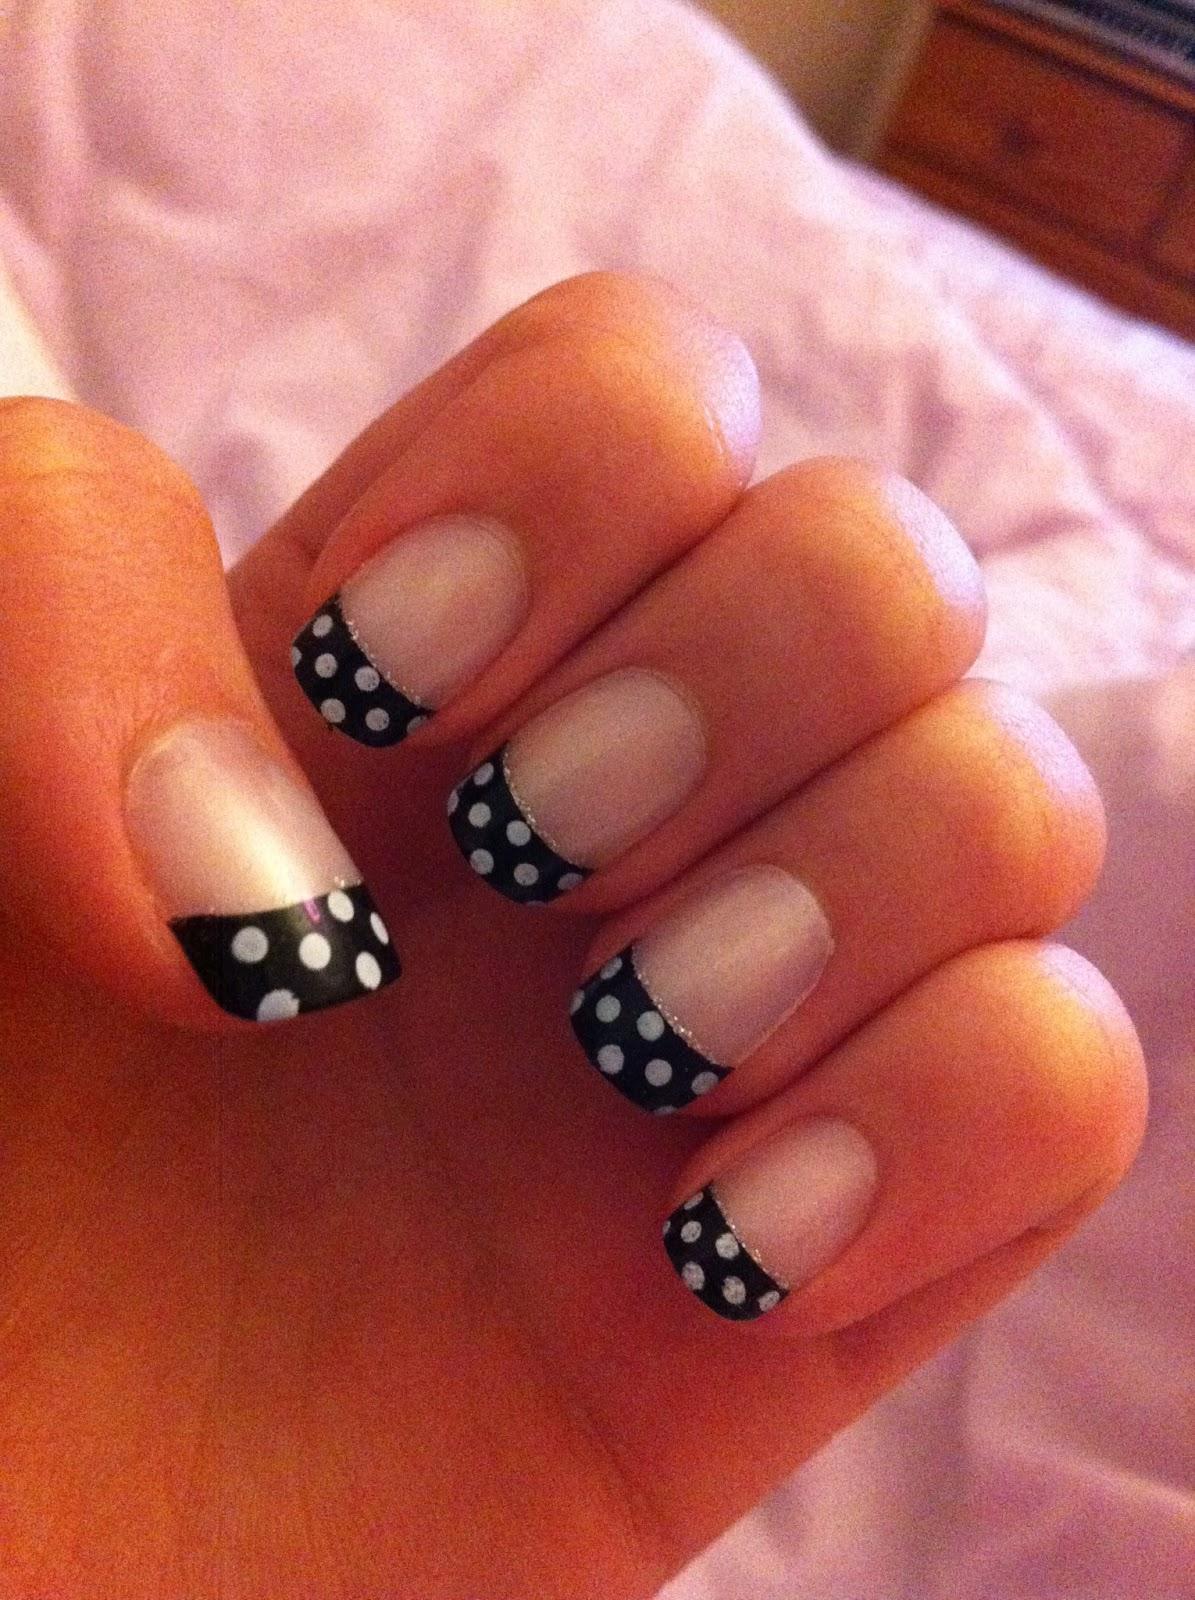 Fashion Nails By Steph: Laurenlovesmakeup'xoxo: Primark Pound Fashion Nails